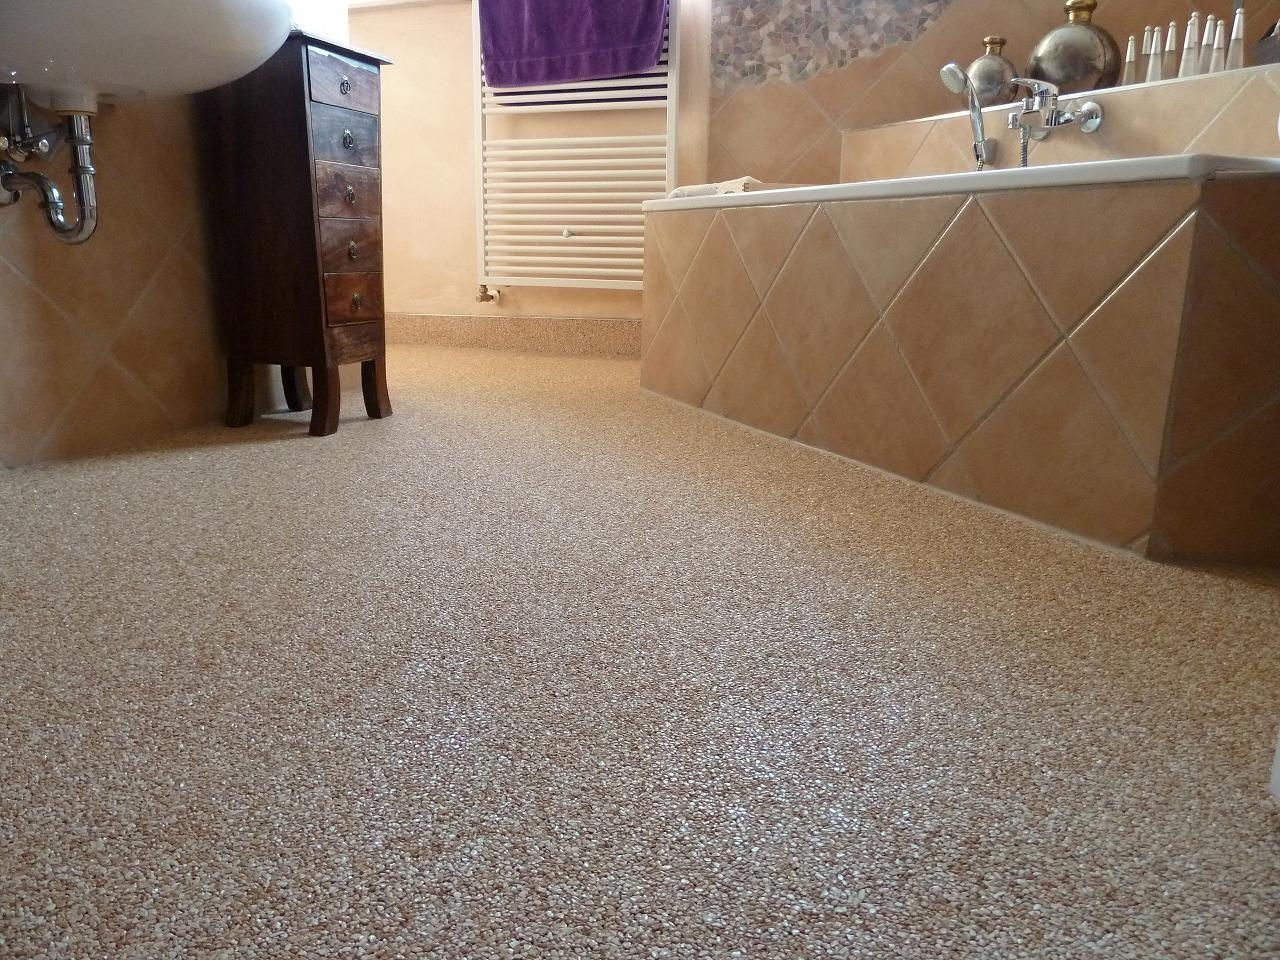 12 Bodenbelag badezimmer epoxidharz